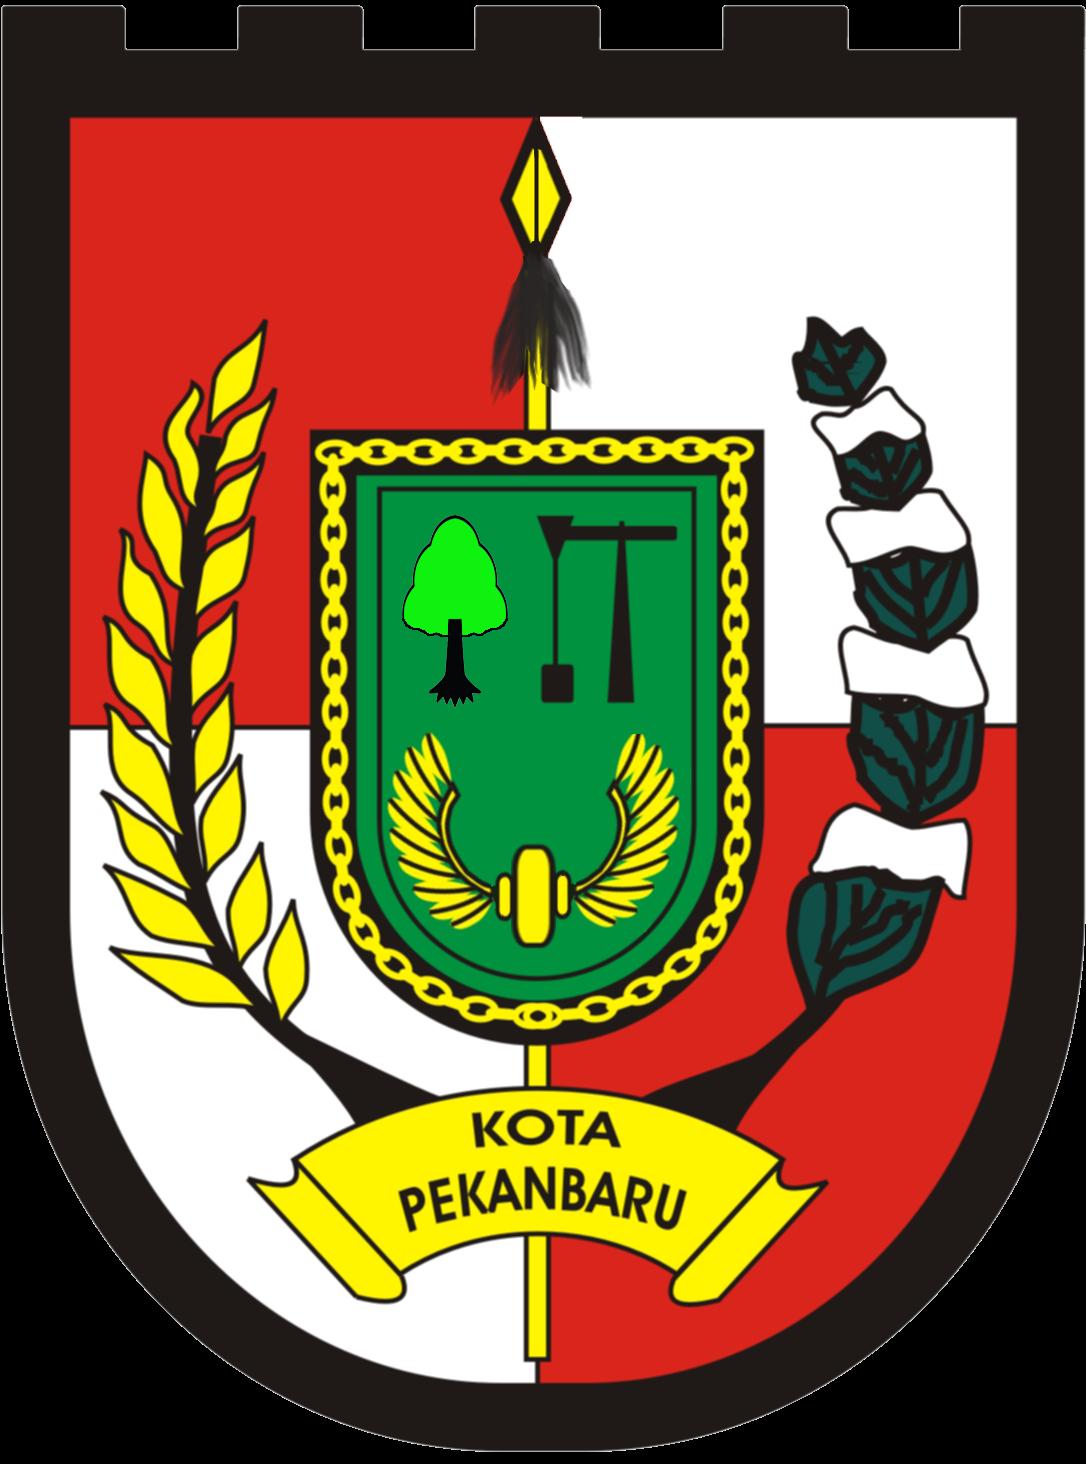 Logo Provinsi Riau : provinsi, Makna, Lambang, Pekanbaru, RiauMagz